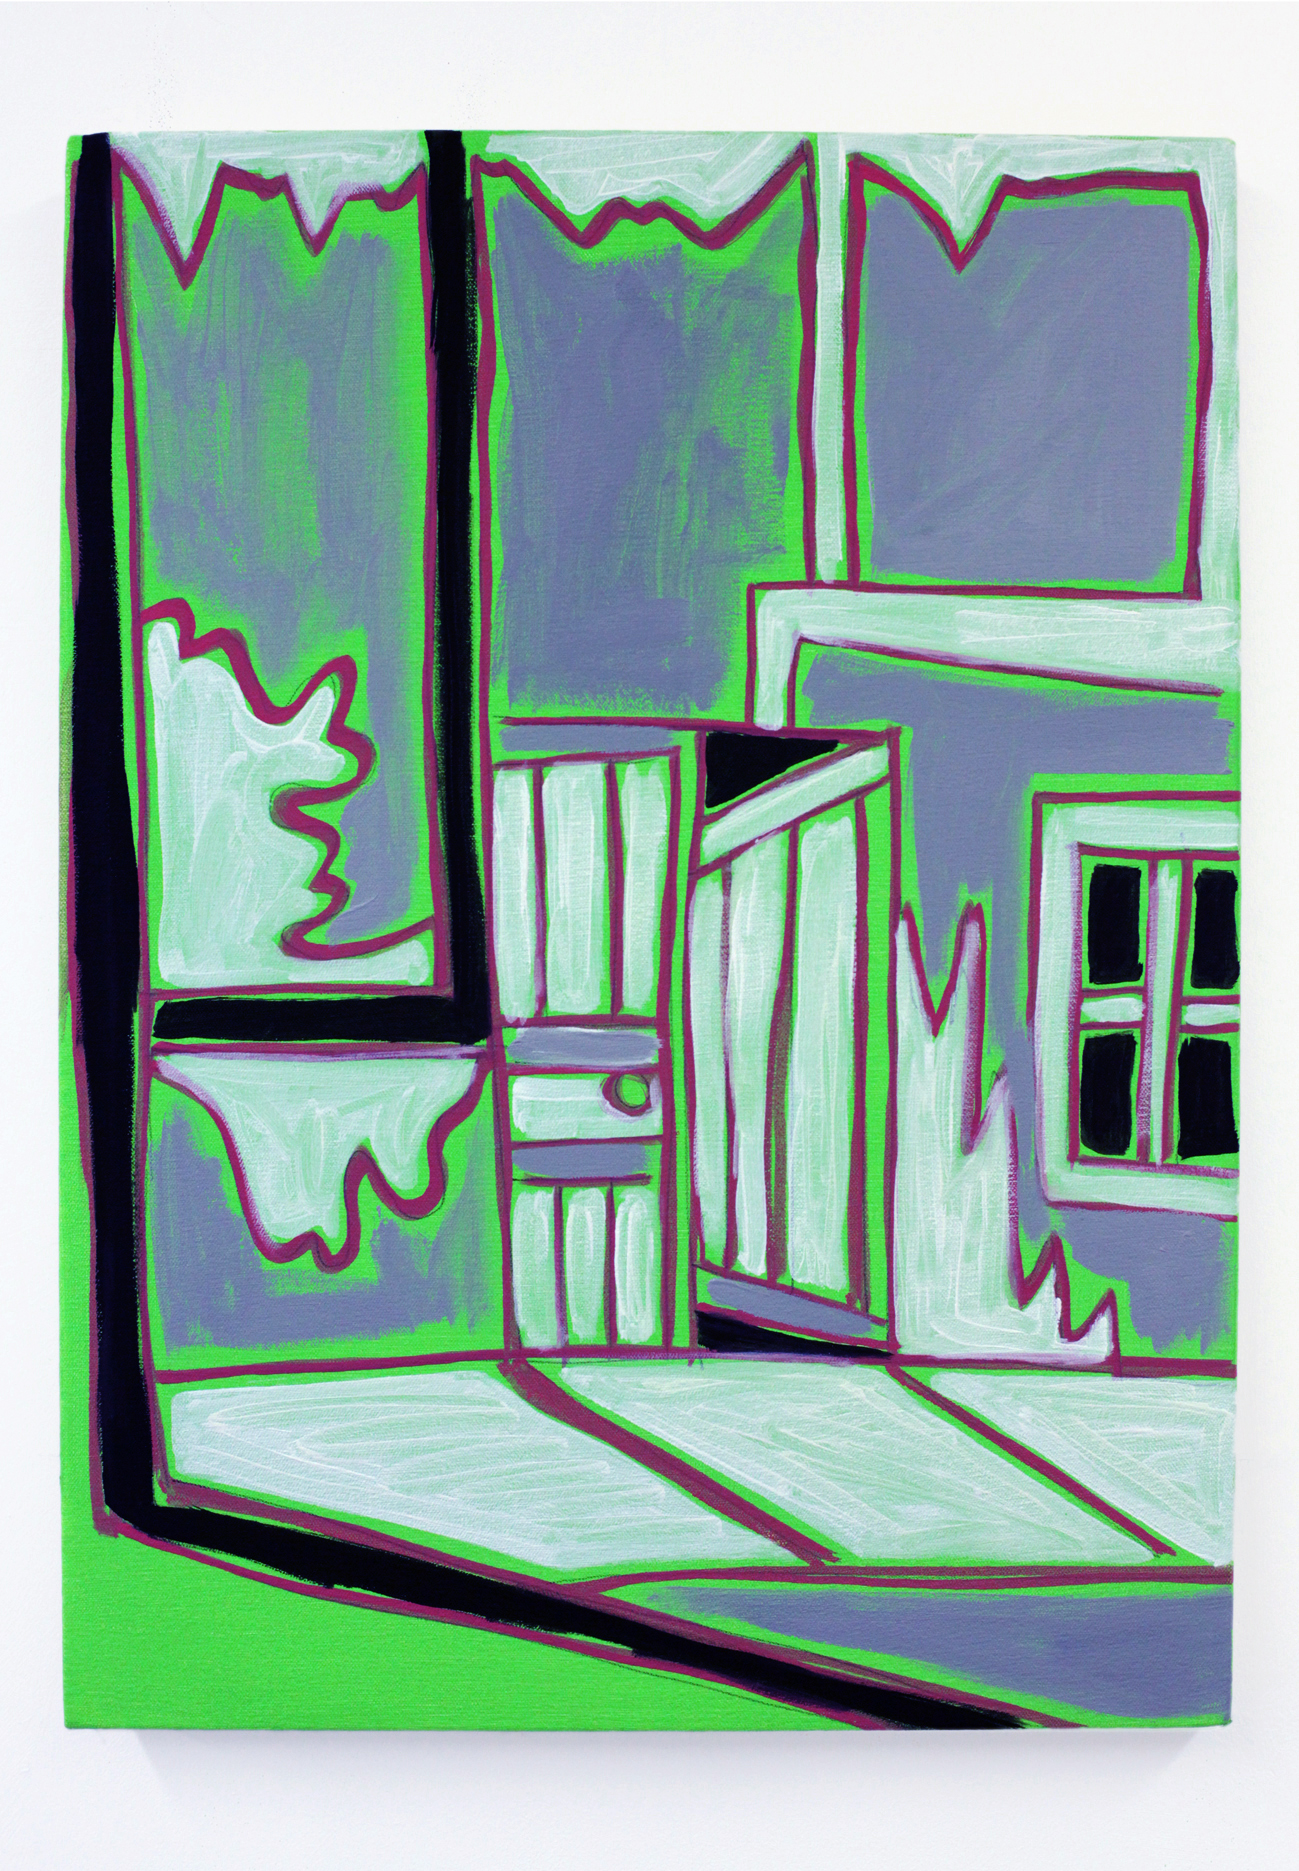 'The door to Giacometti's studio', 2015, oil on canvas, 30 x 40 cm